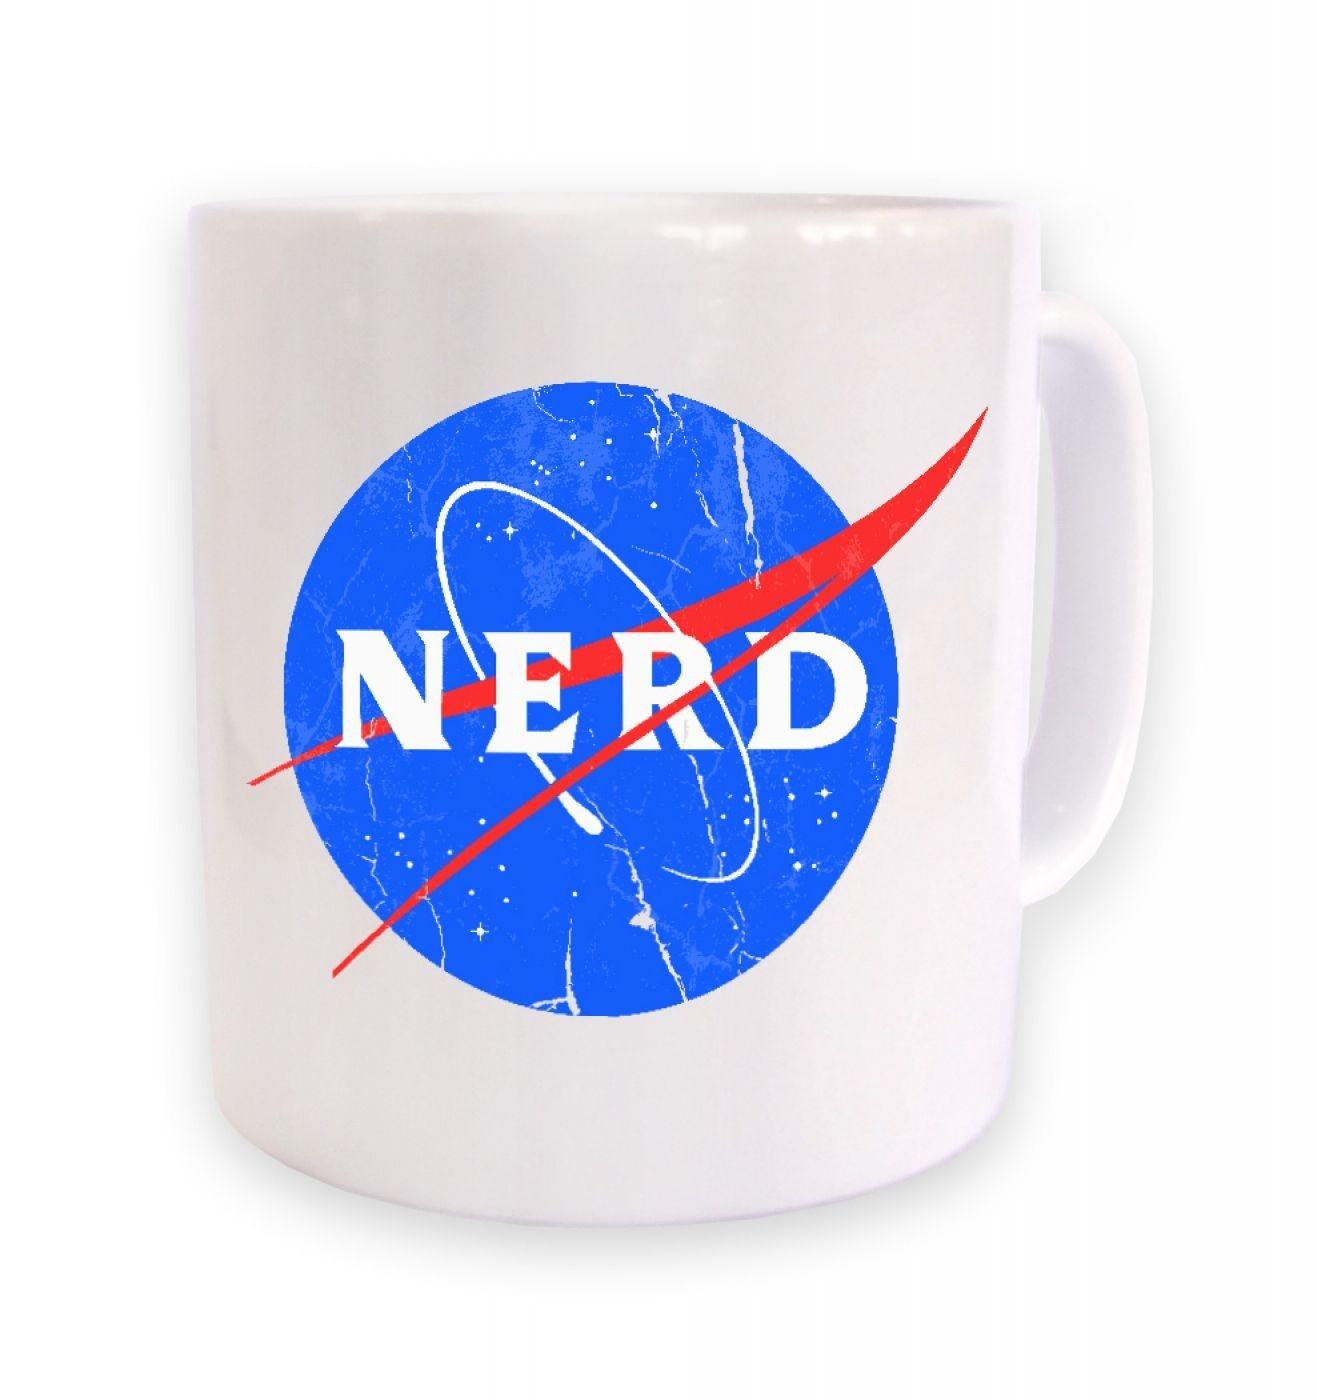 Nerd NASA logo mug